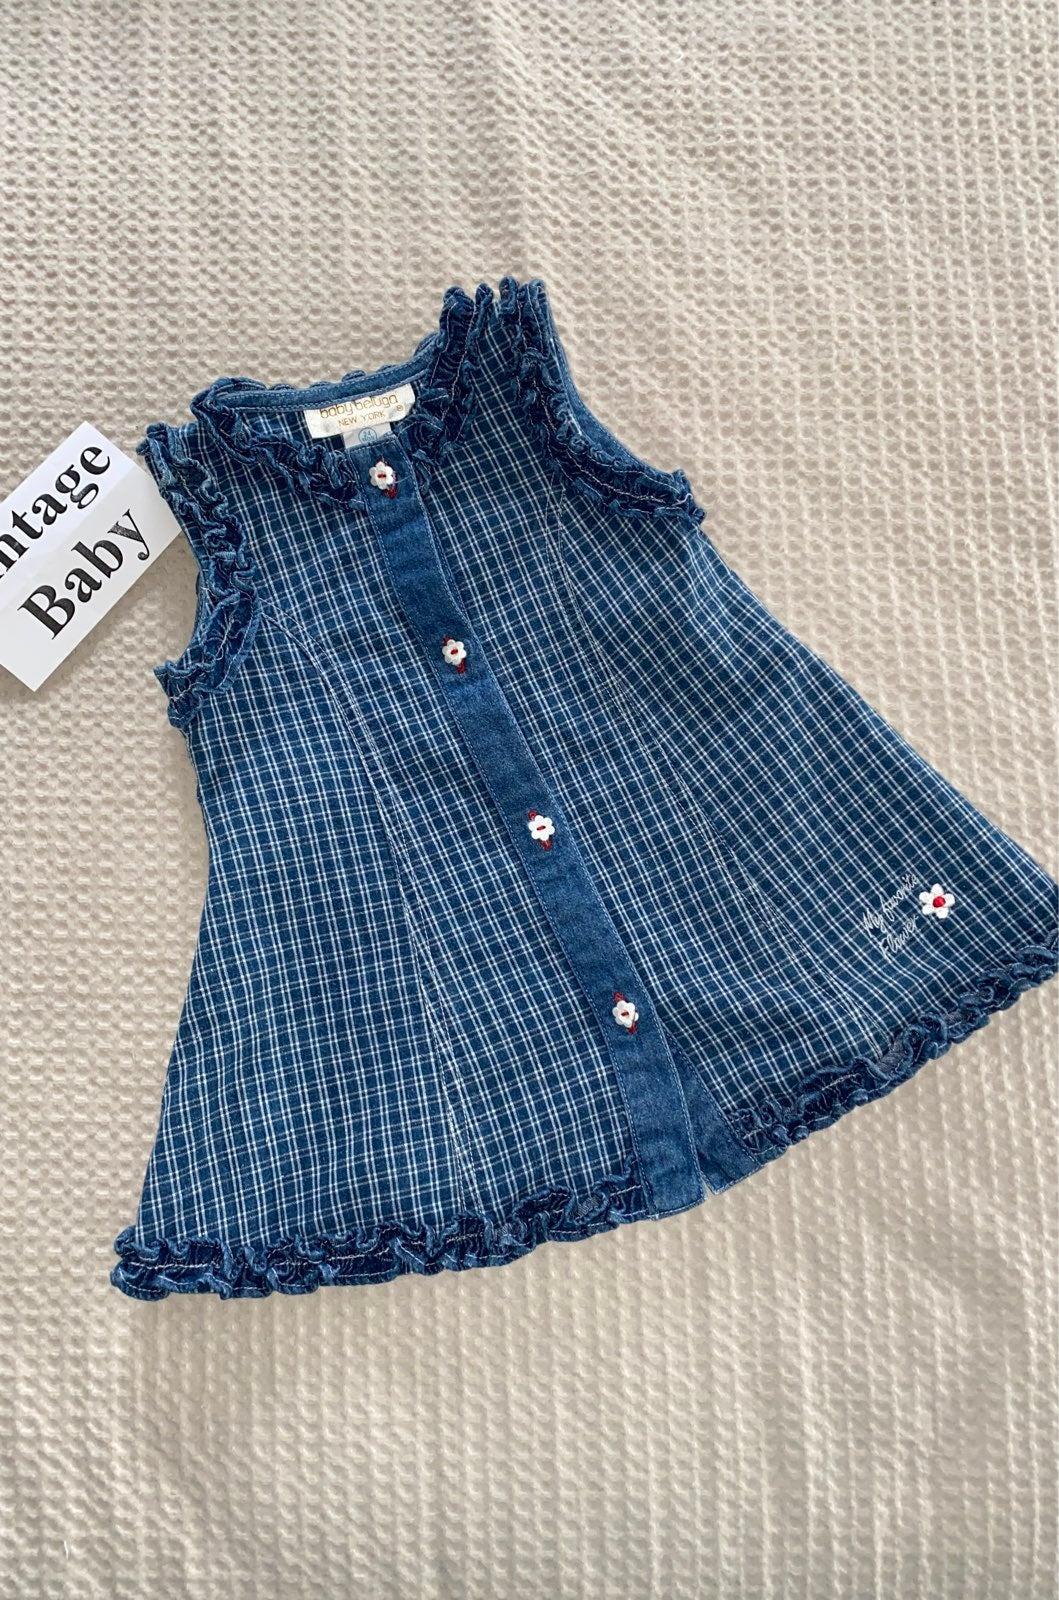 Vintage baby Dress, 24M